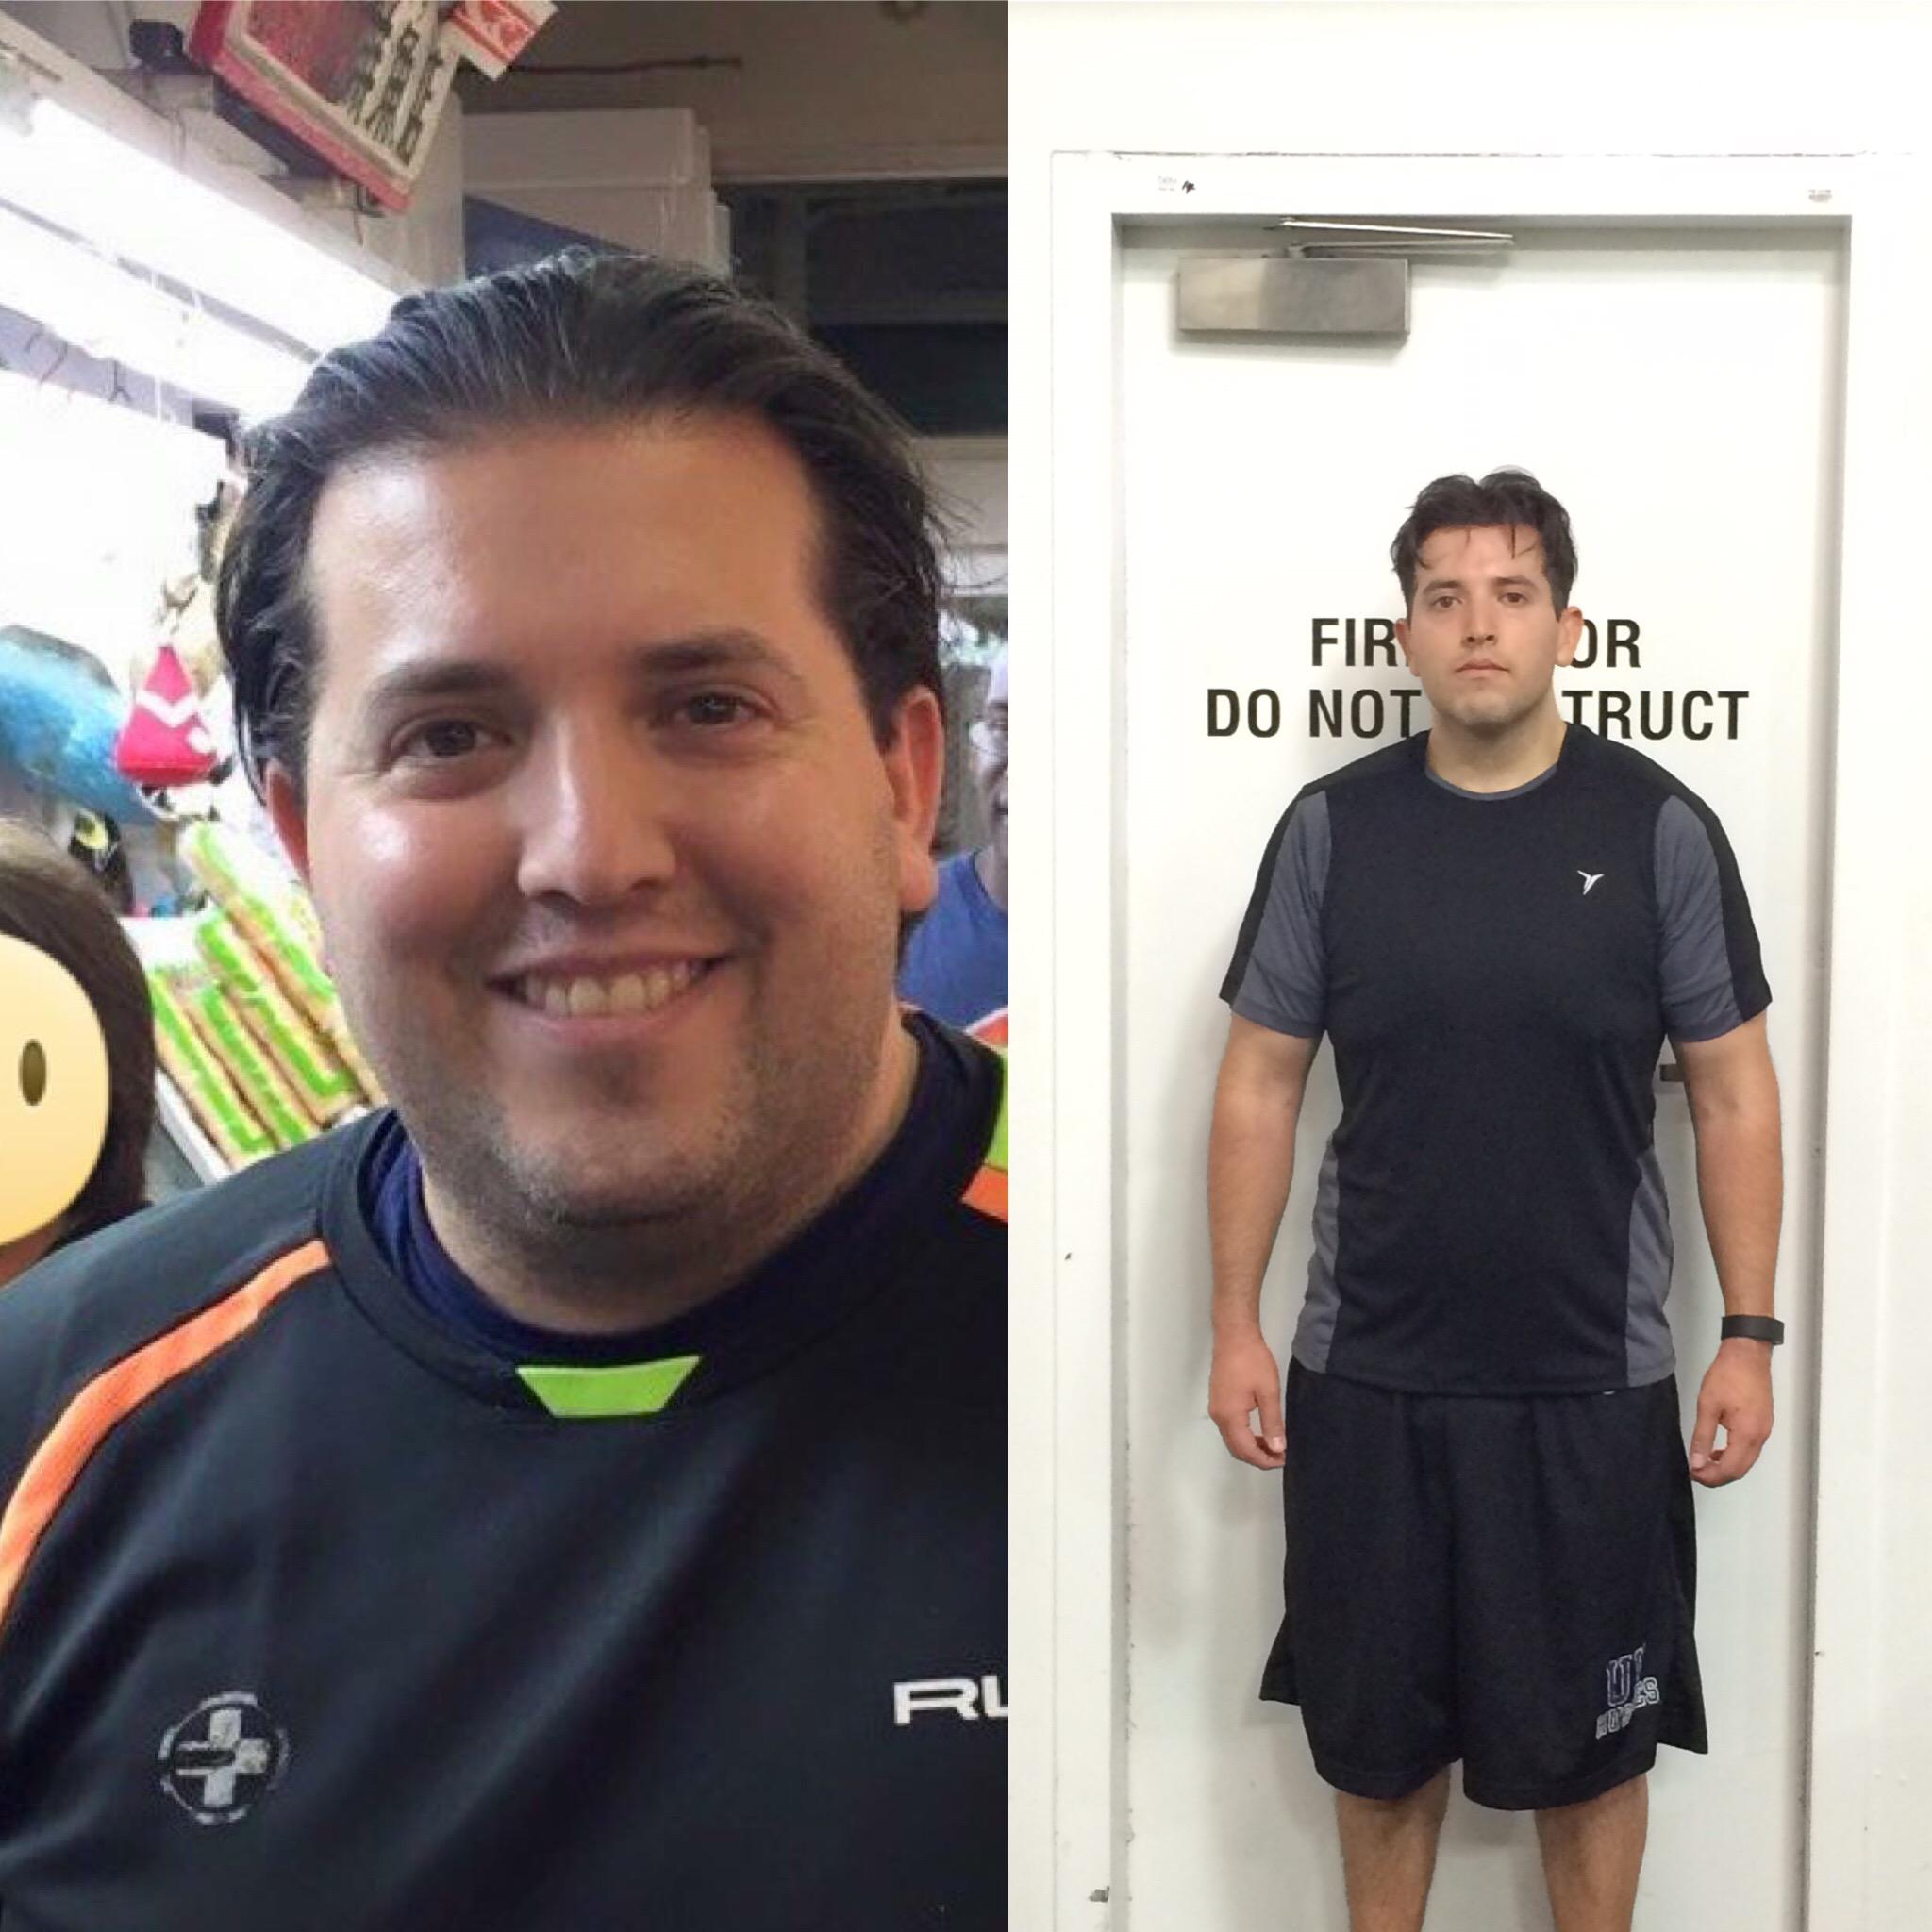 Jake Silzer - 34% Body fat - 22% Body fat